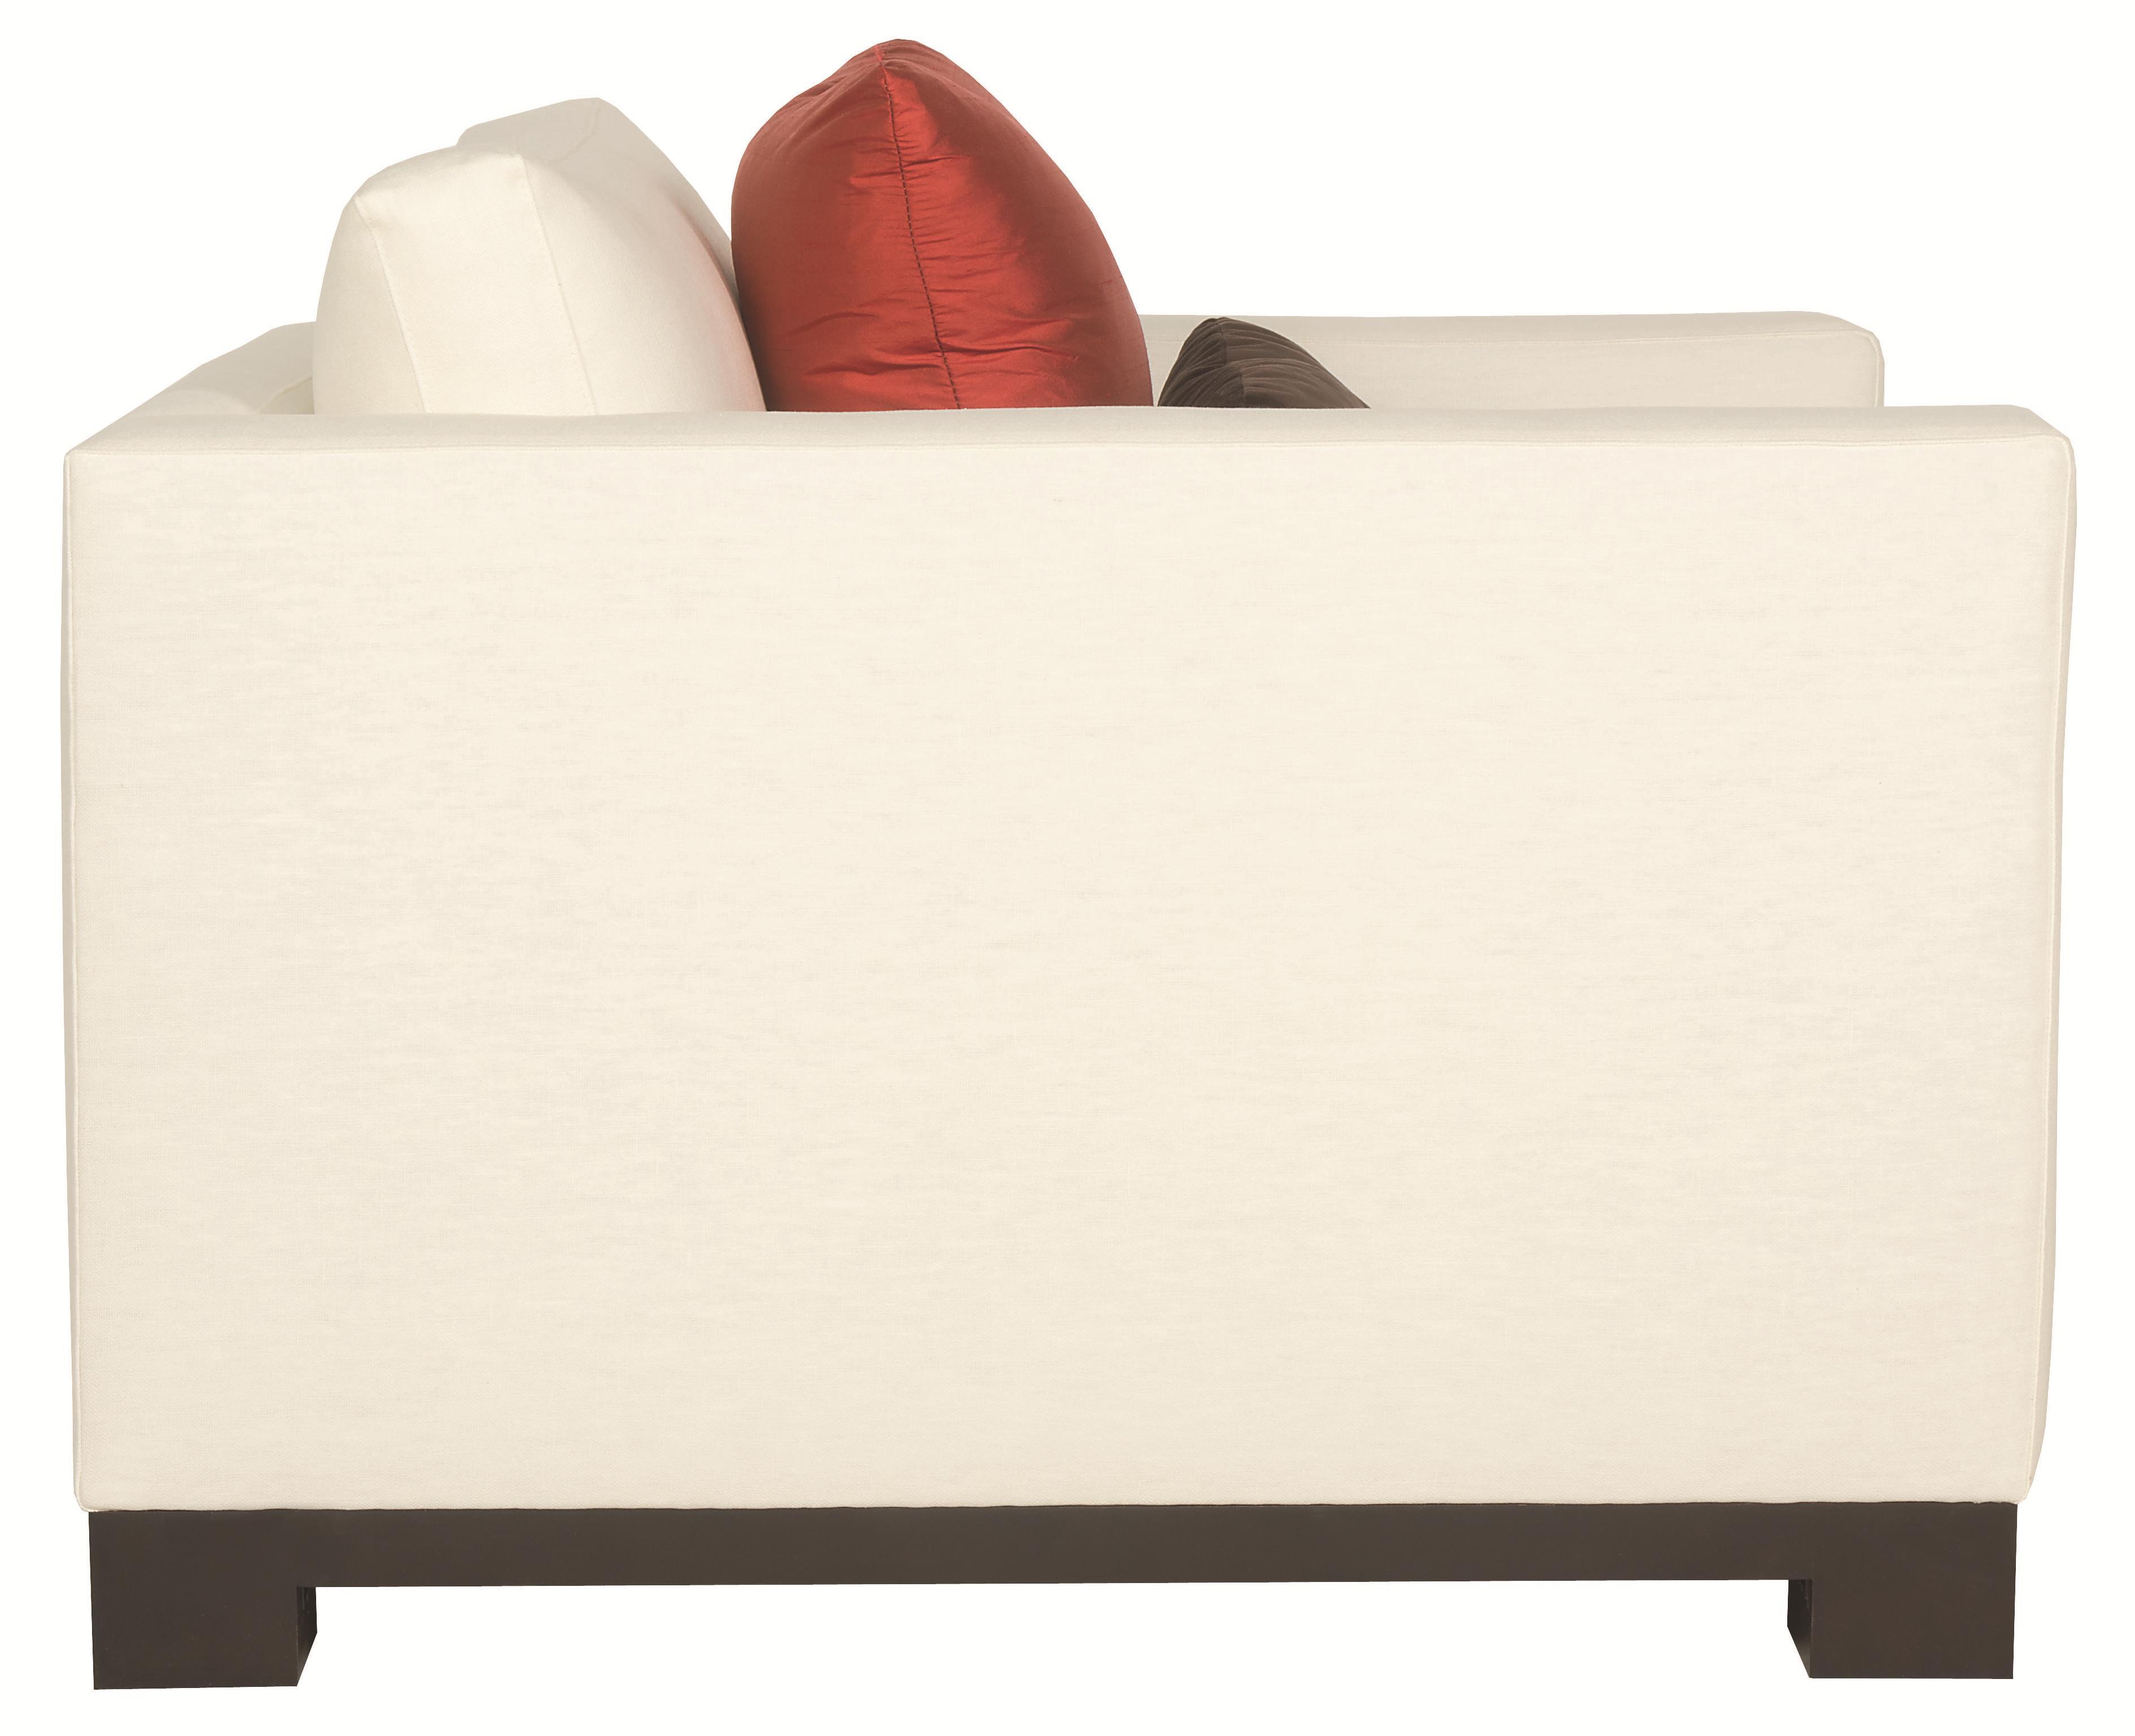 Bernhardt Lanai Modern Living Room Chair with High End  : products2Fbernhardt2Fcolor2Flanai20n165n1652 b2 from www.jacksonvillefurnituremart.com size 3782 x 3076 jpeg 481kB